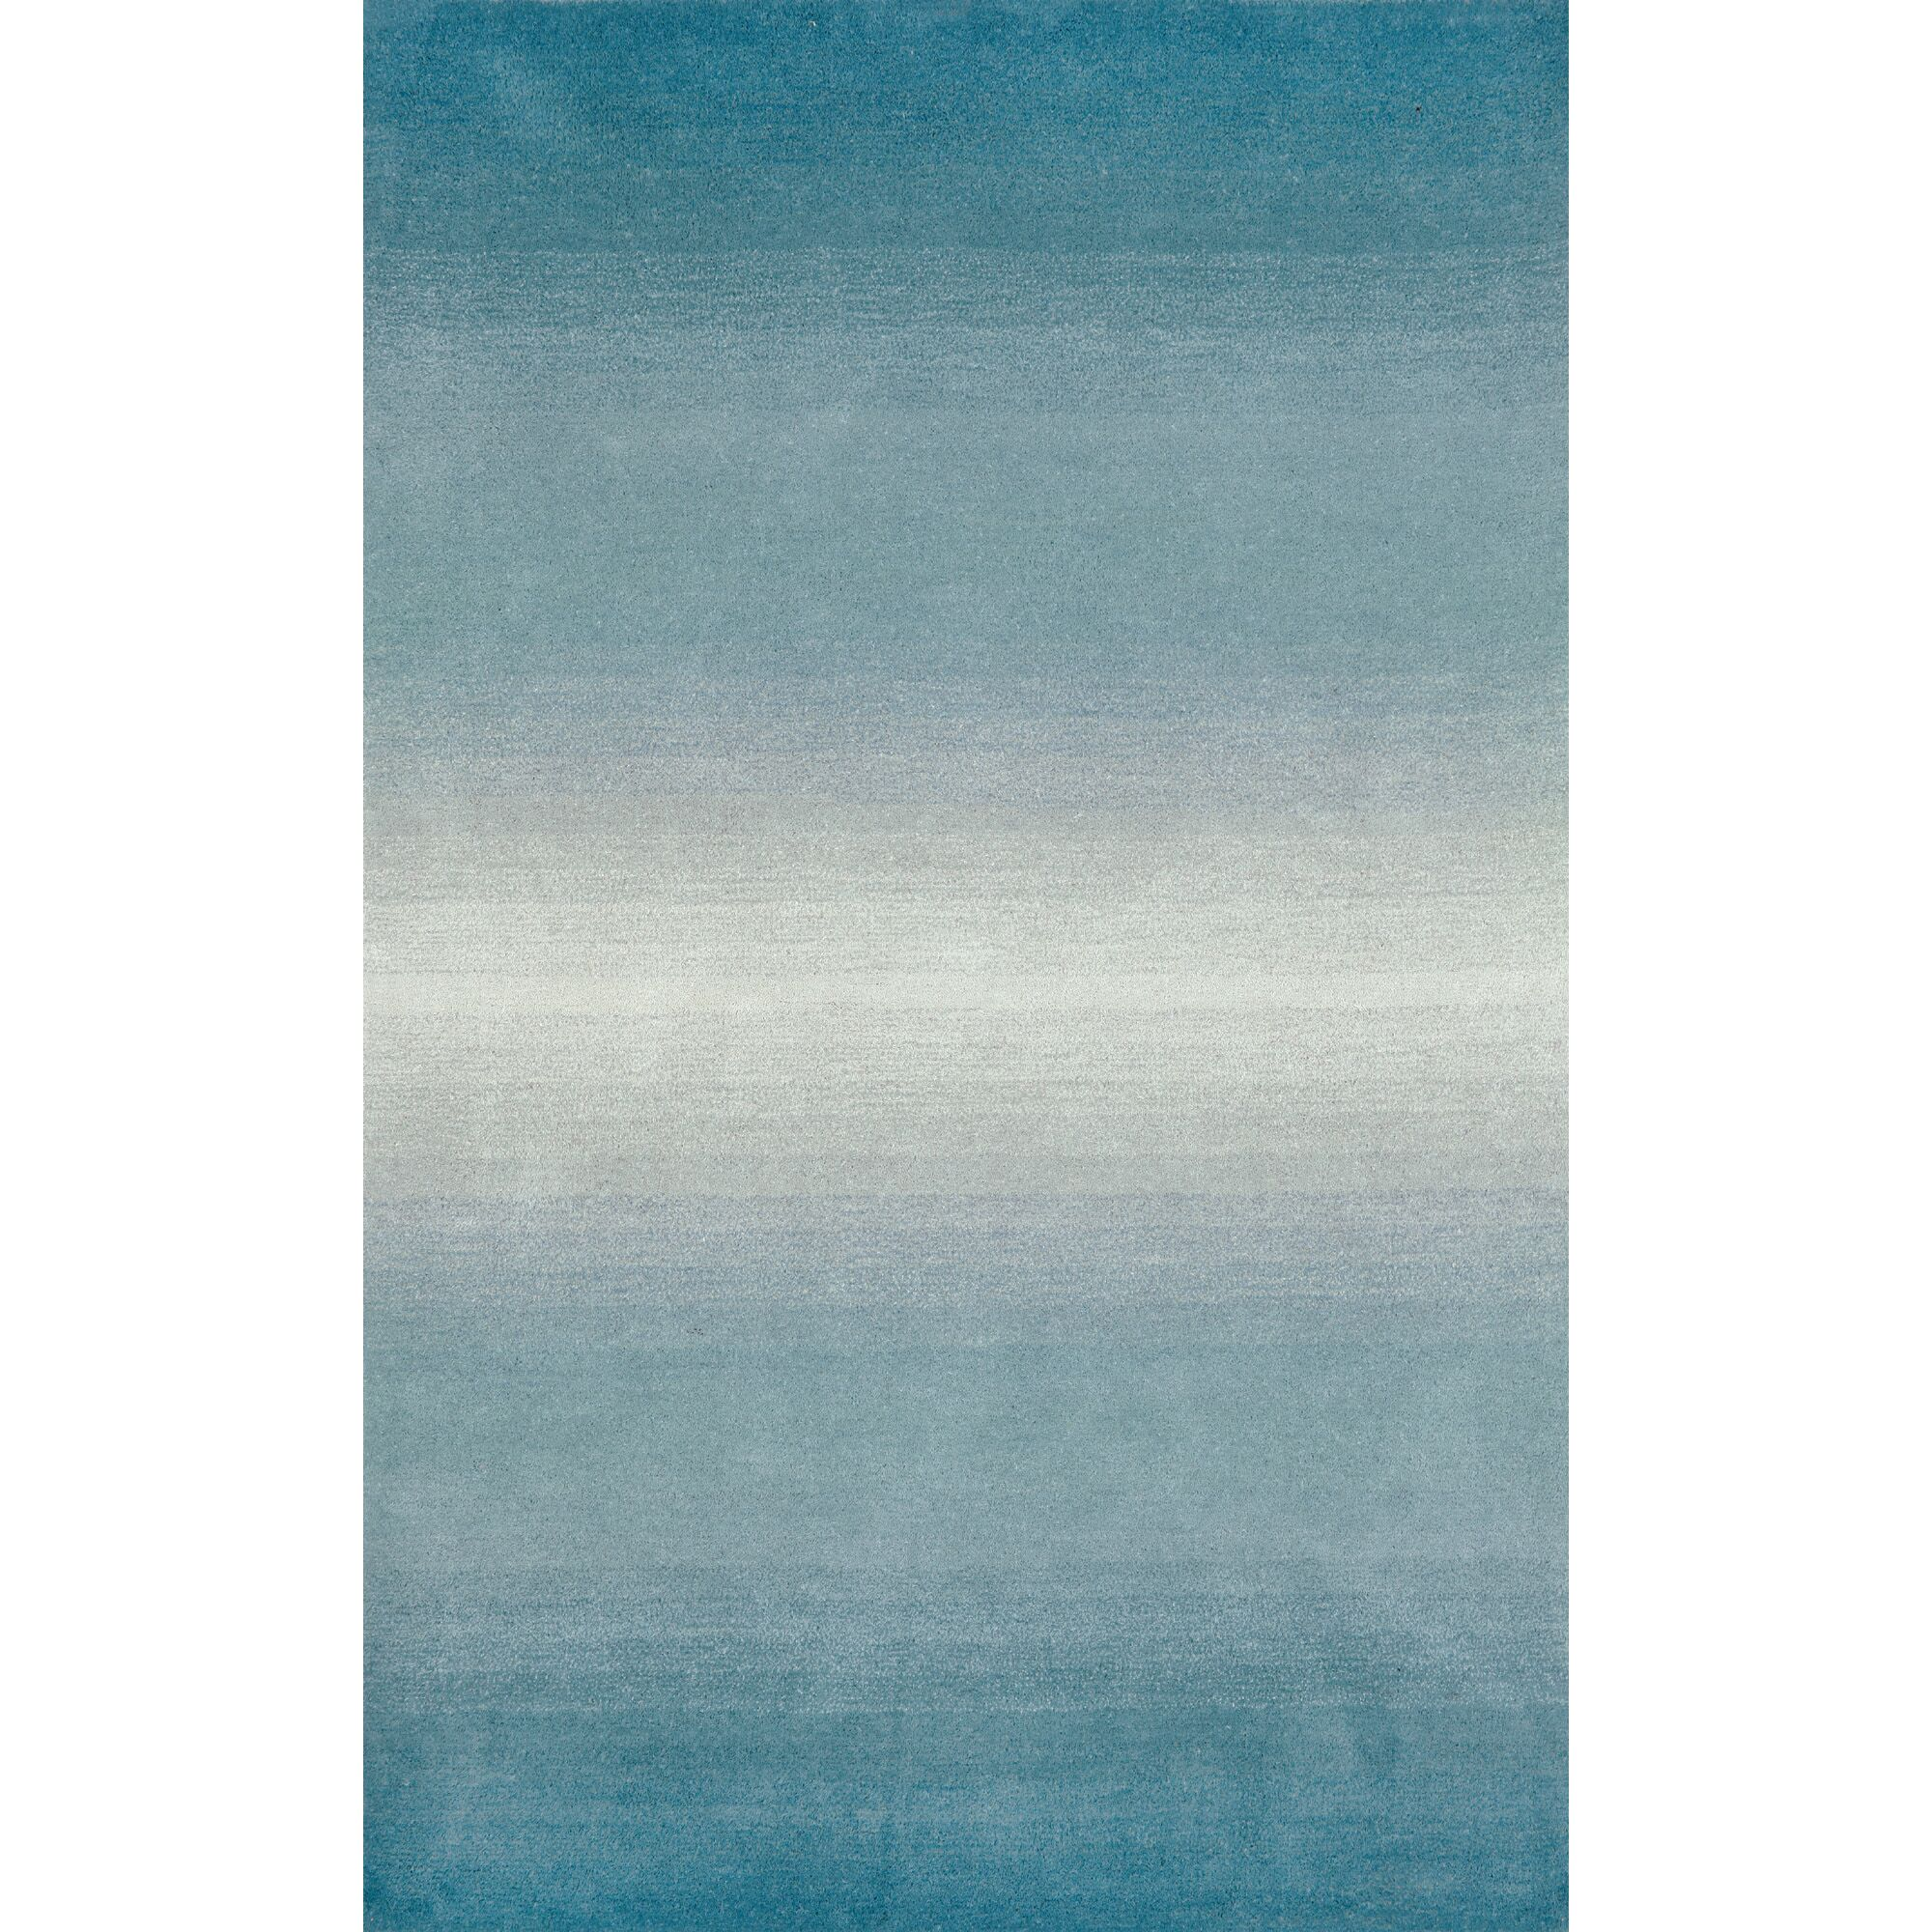 Belding Aqua Horizon Area Rug Rug Size: Rectangle 3'6